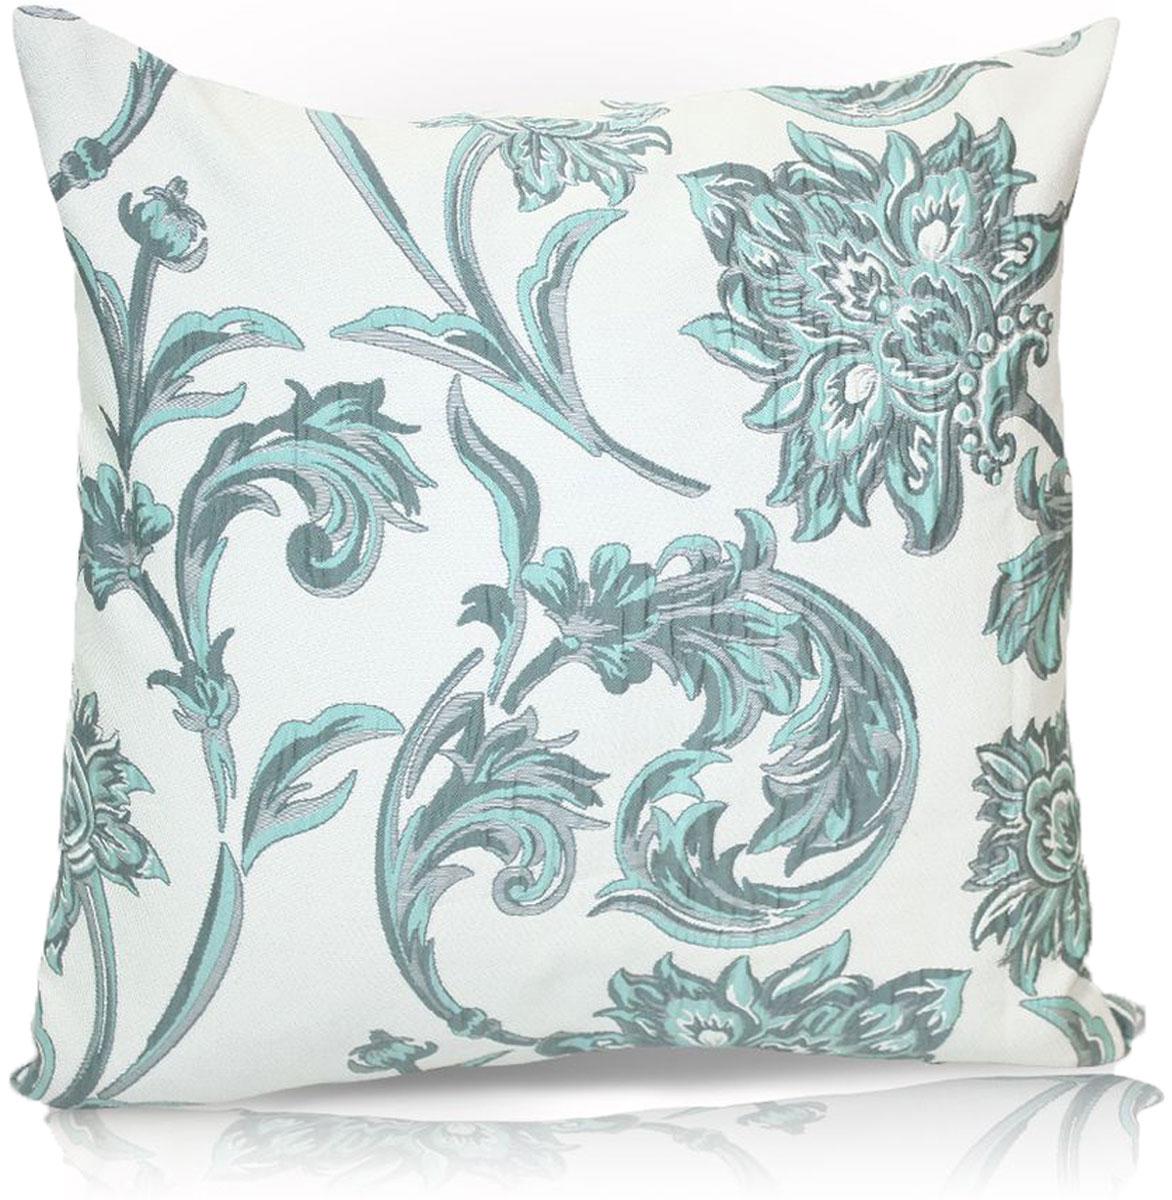 Подушка декоративная KauffOrt Руан, цвет: белый, голубой, 40 x 40 см. 3121040640